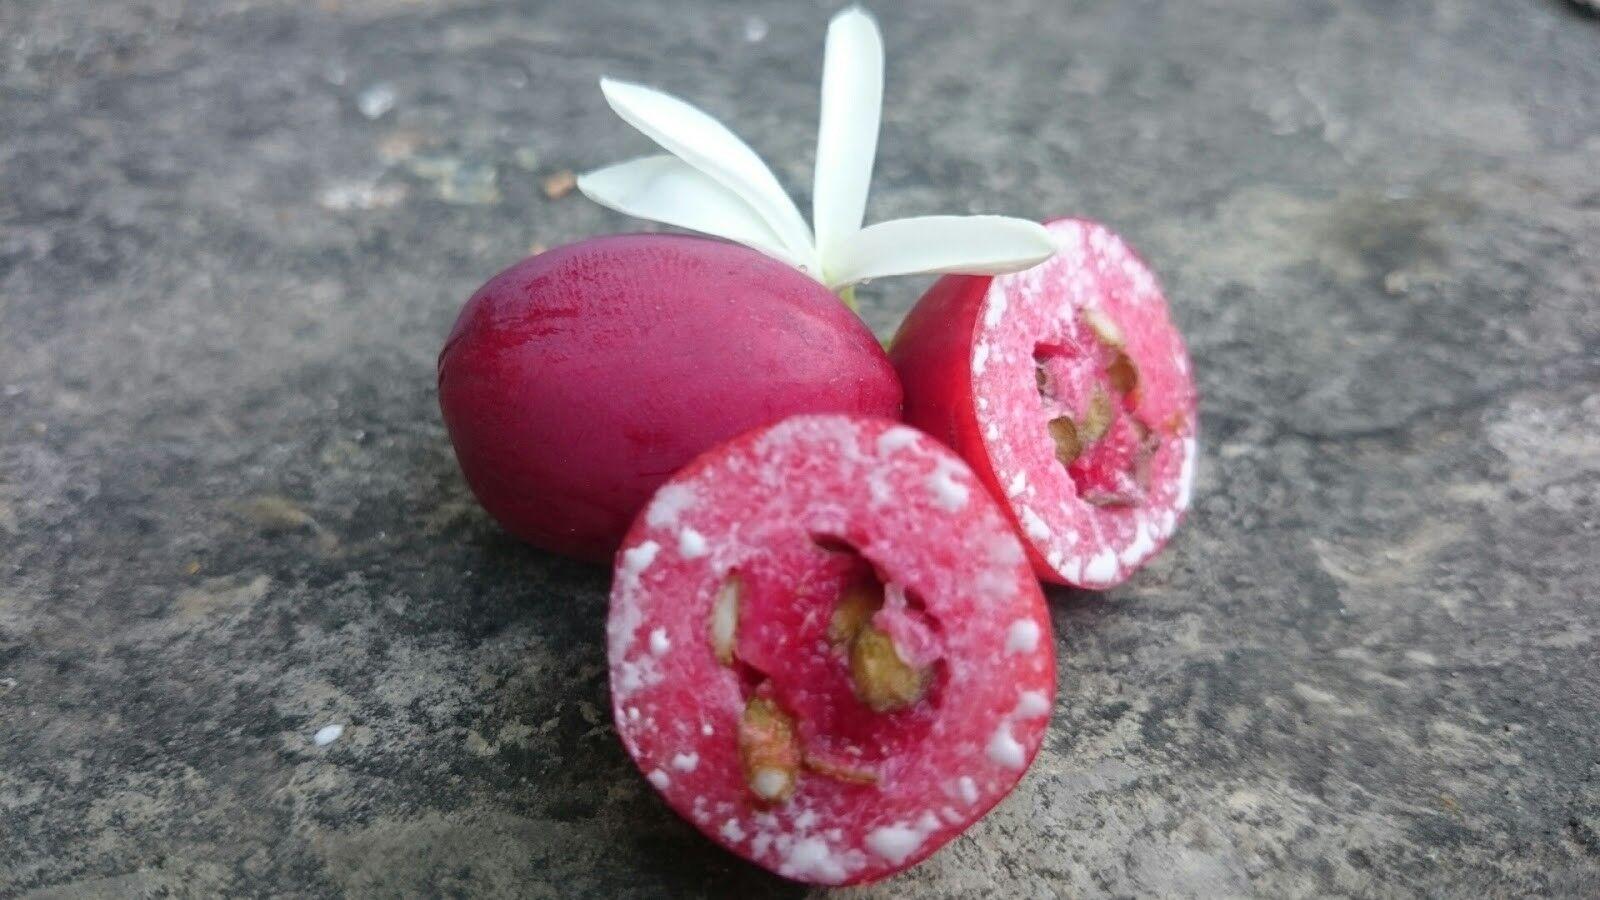 Plant de Prunier du Natal ou Cocheissa macroCochepa Arbre Fruitier Plante jardin pot